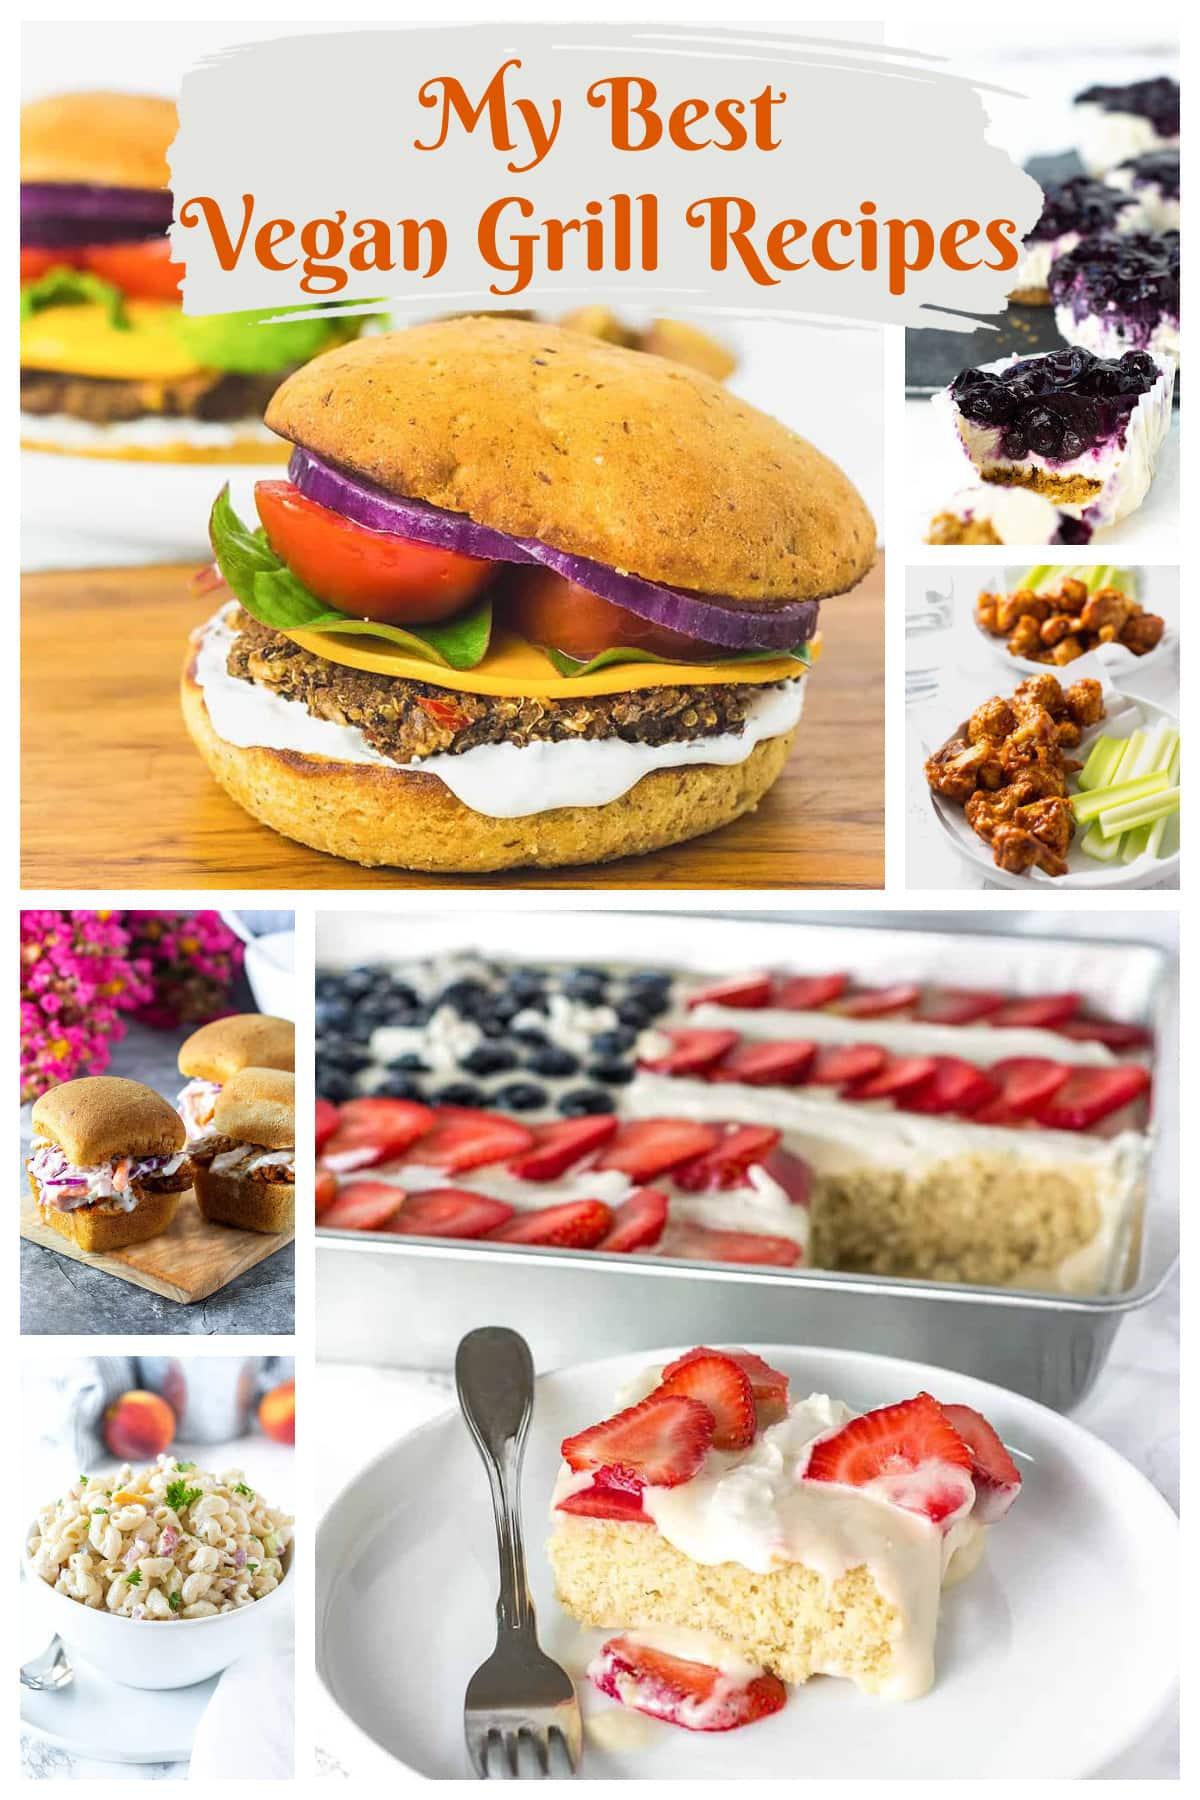 My Best Vegan Grill Recipes